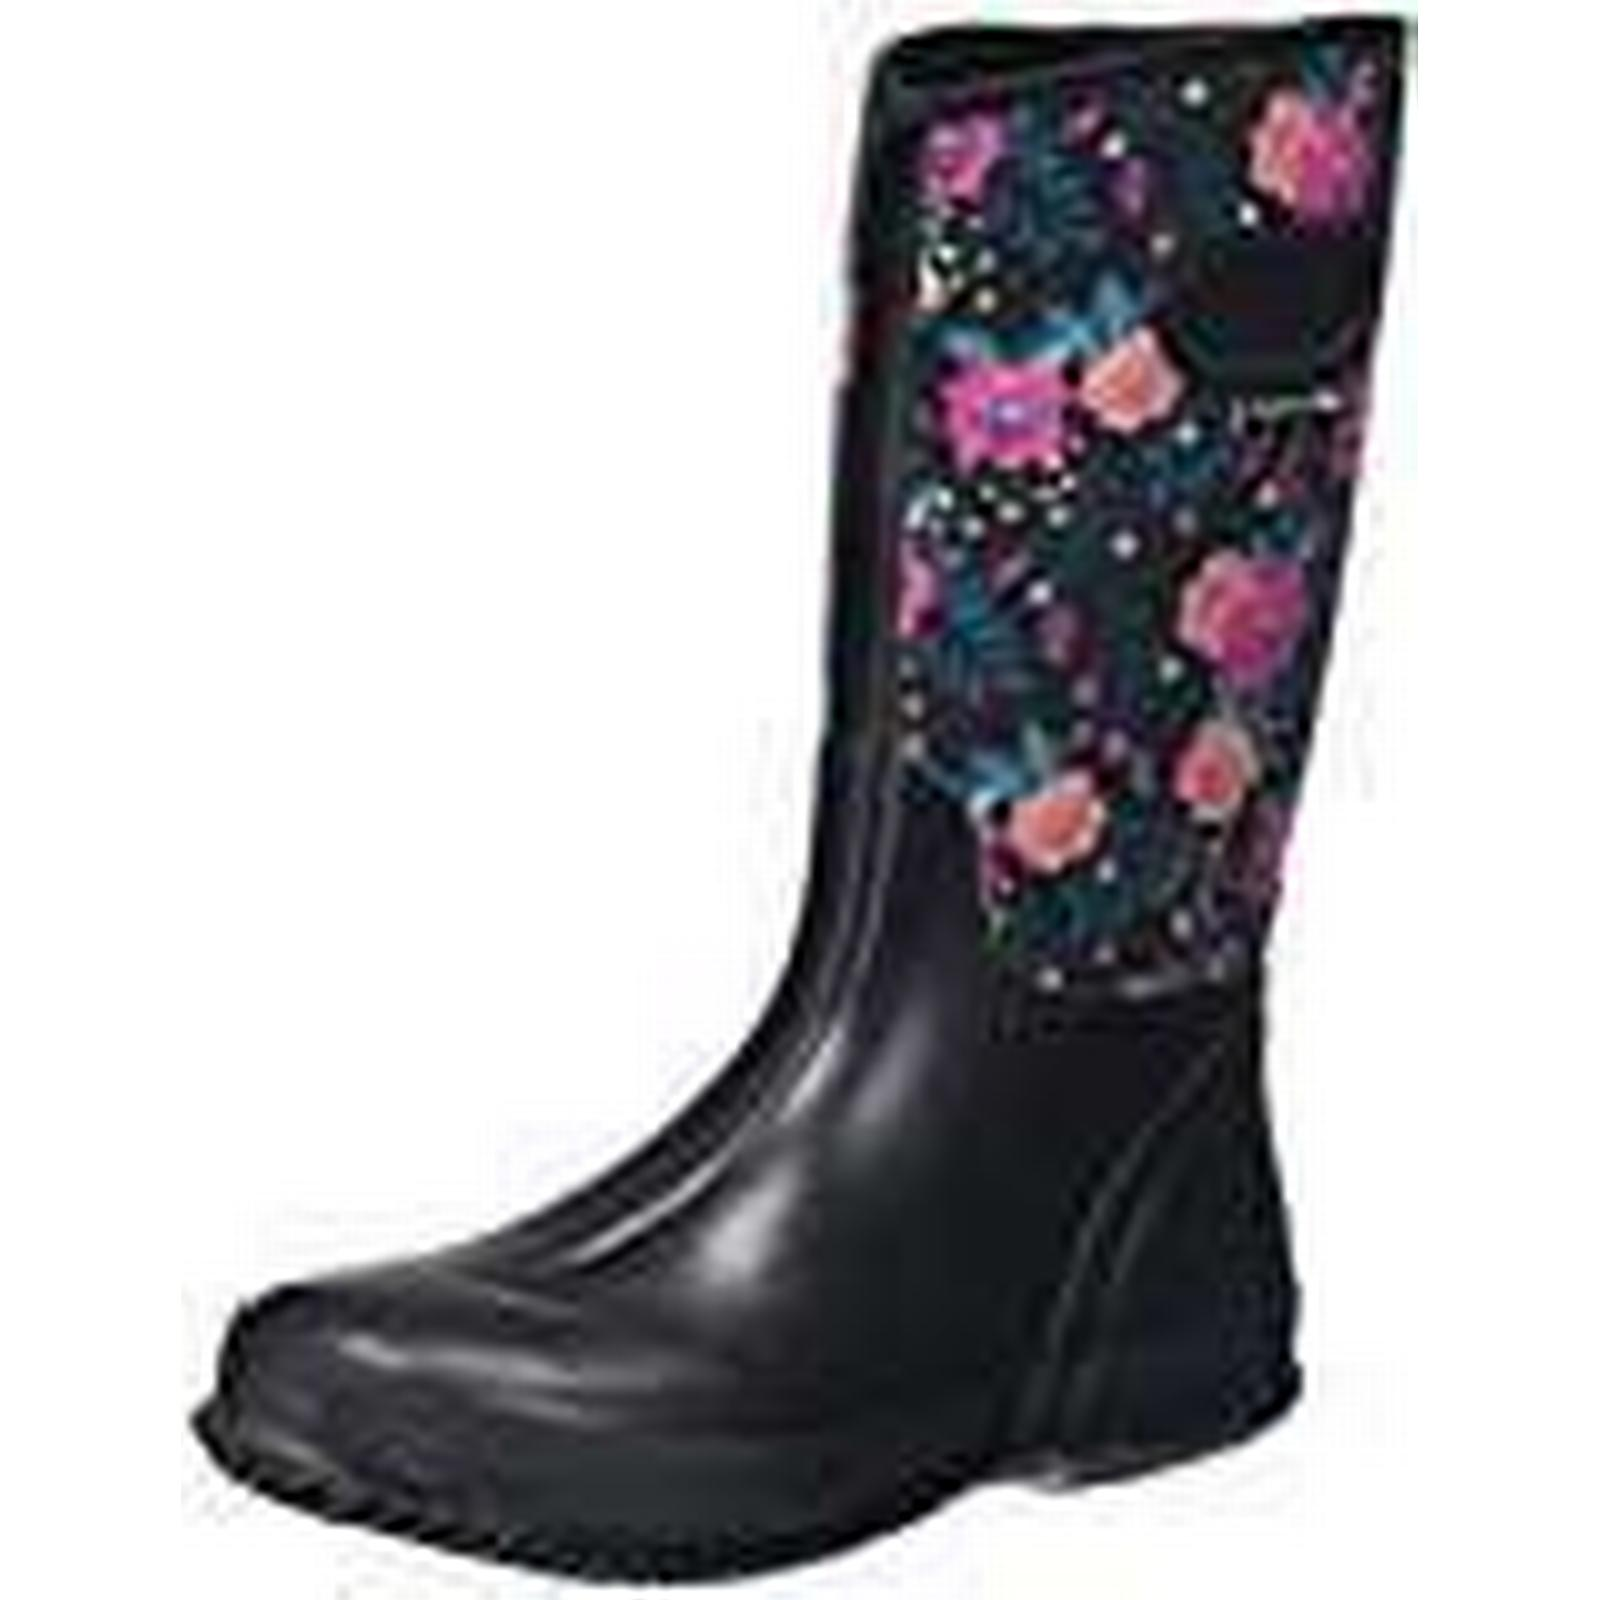 Trespass 41, Geraldine, Bold Floral Print, 41, Trespass Waterproof Wellington Boots for Women, UK Size 8, Black 8f5c78